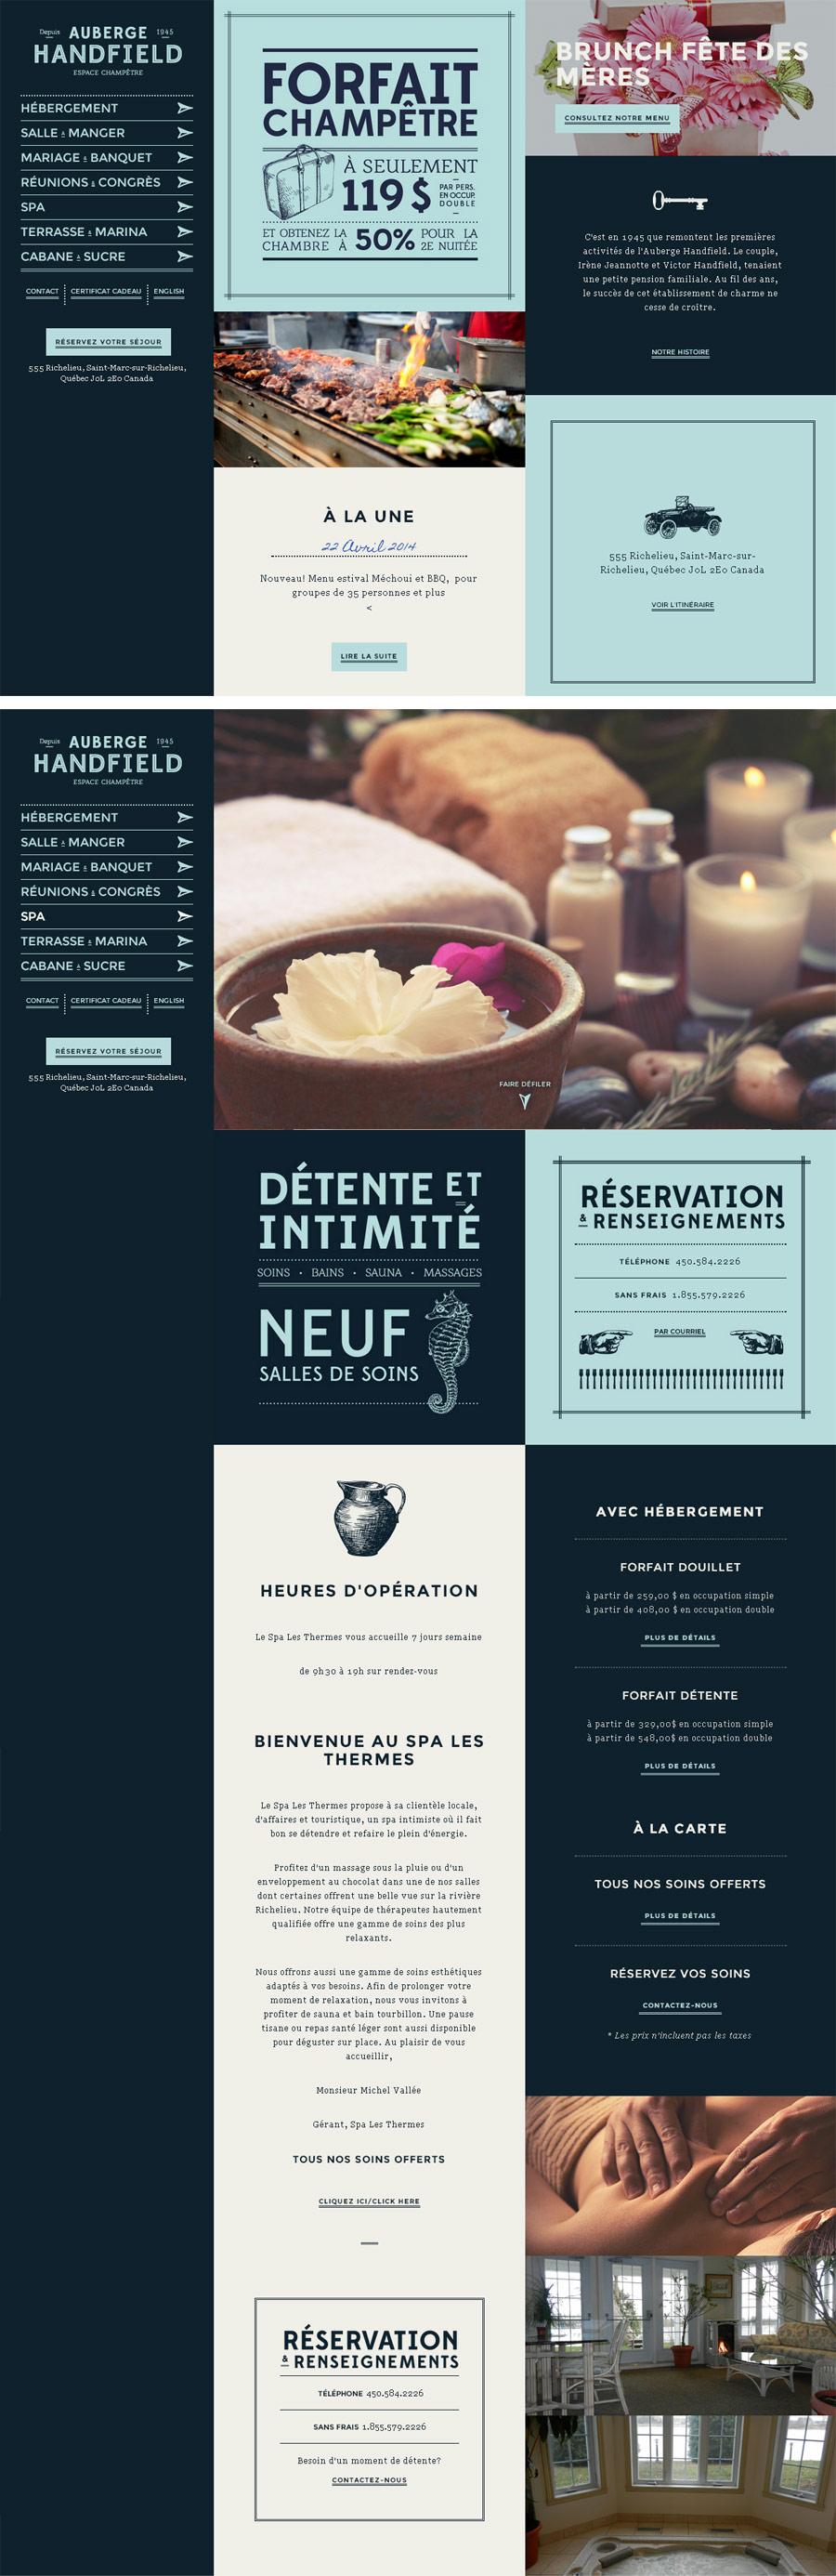 Auberge Handfield - Inspiración web design